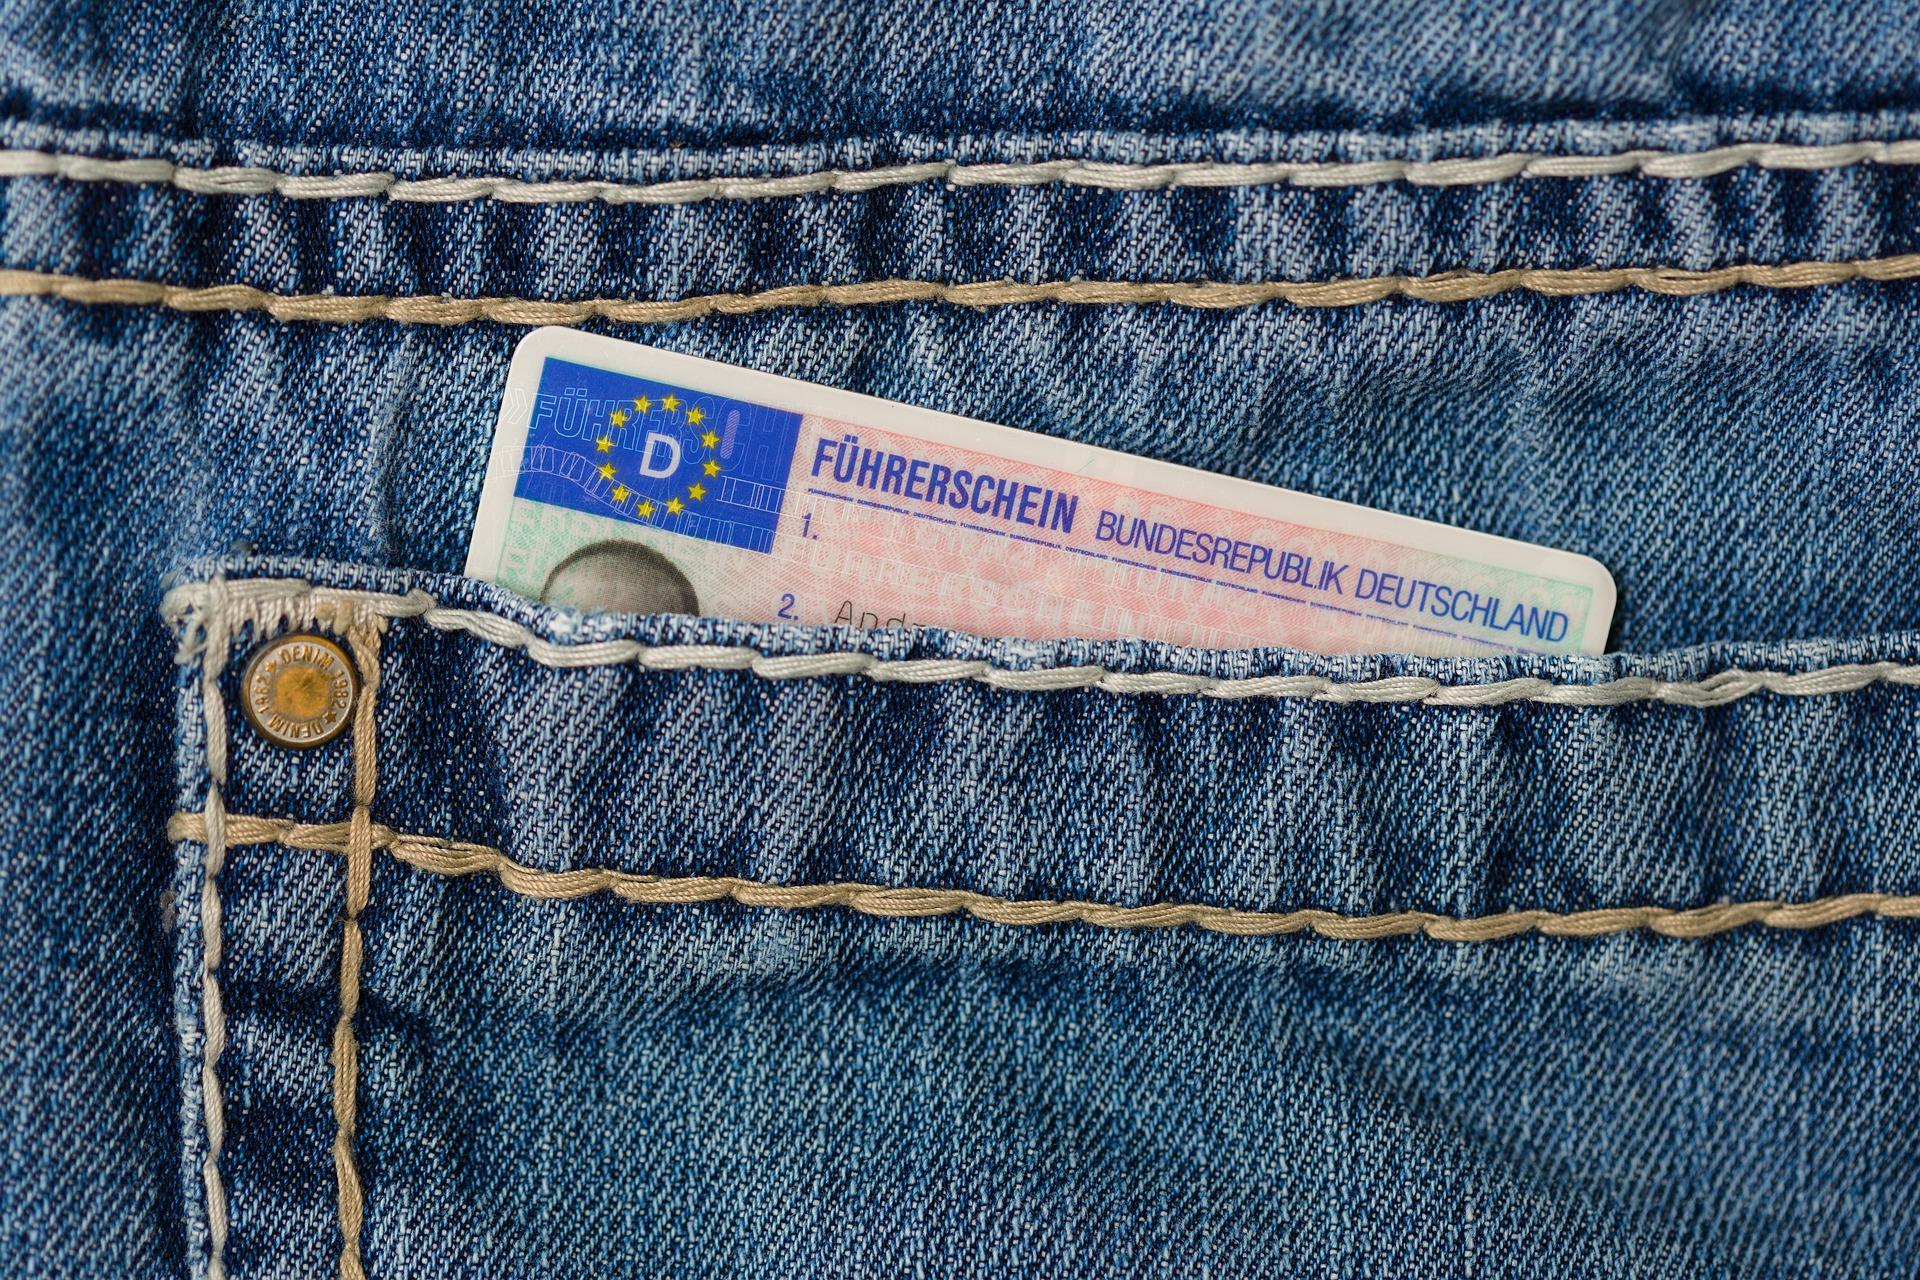 identification in pocket